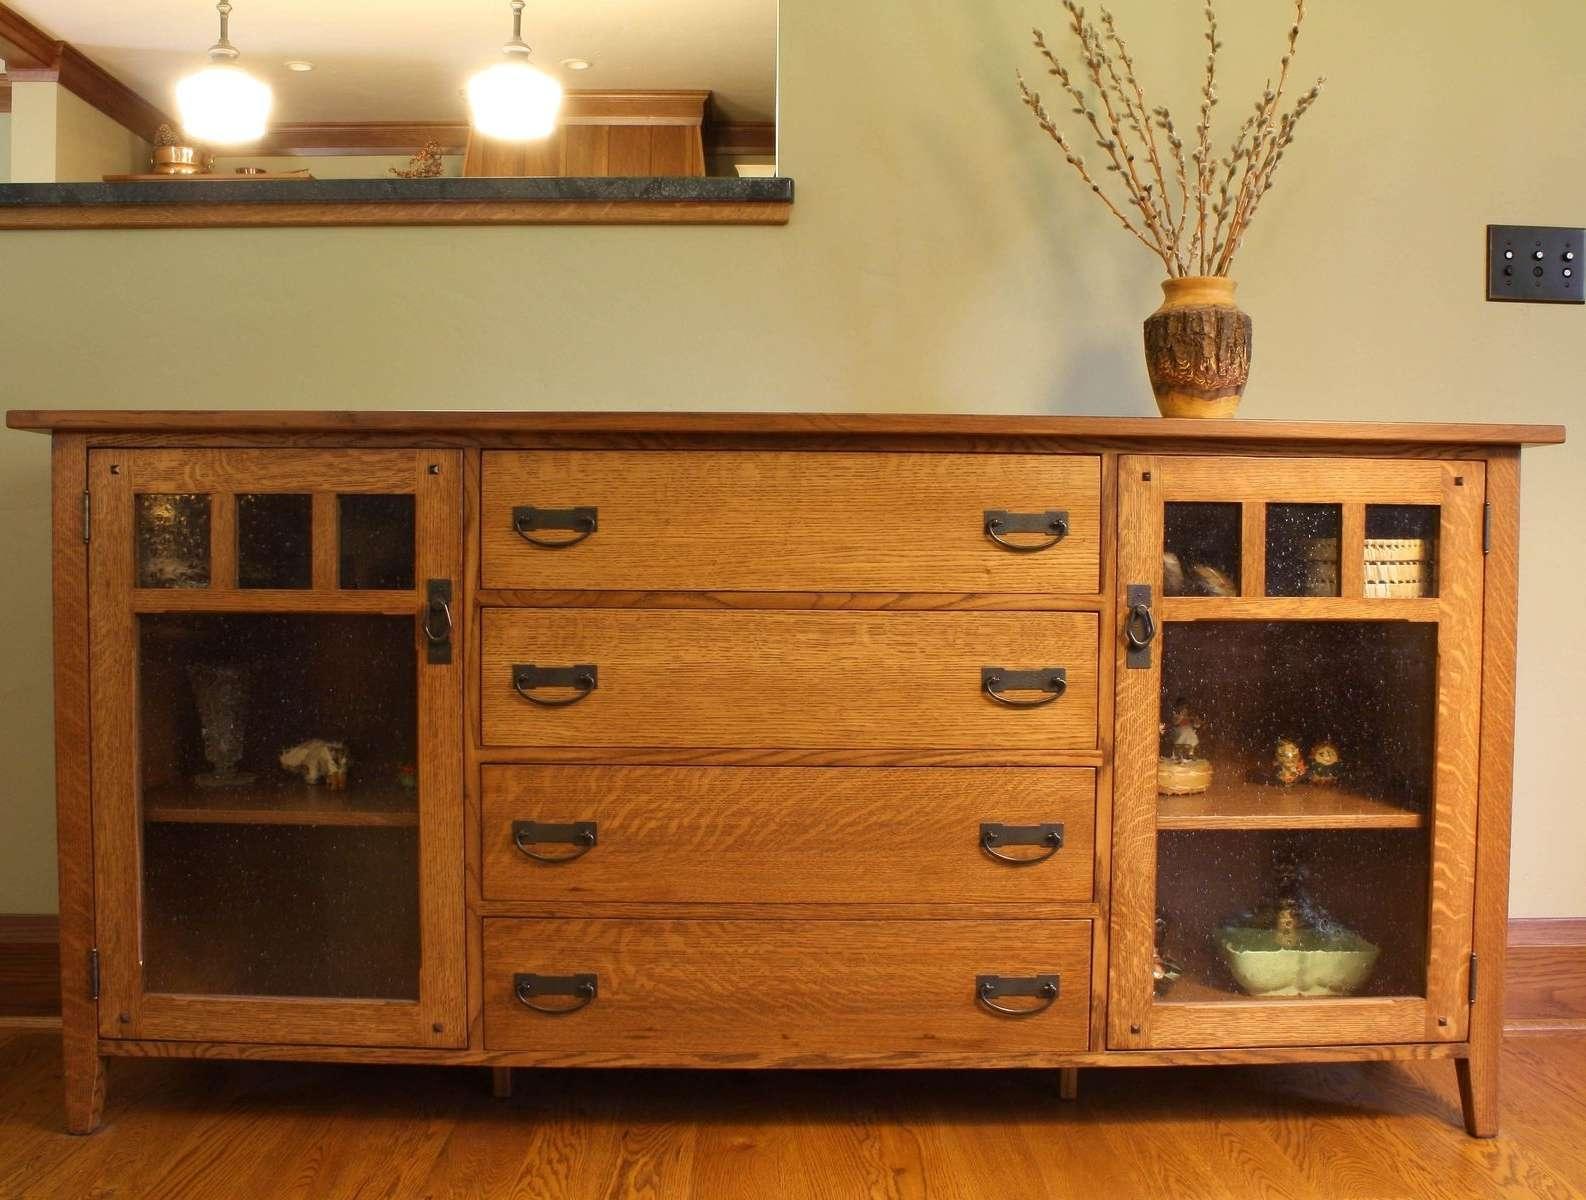 Hand Made Arts & Crafts Sideboardmontana Cabinet & Canoe Regarding Montana Sideboards (View 2 of 20)